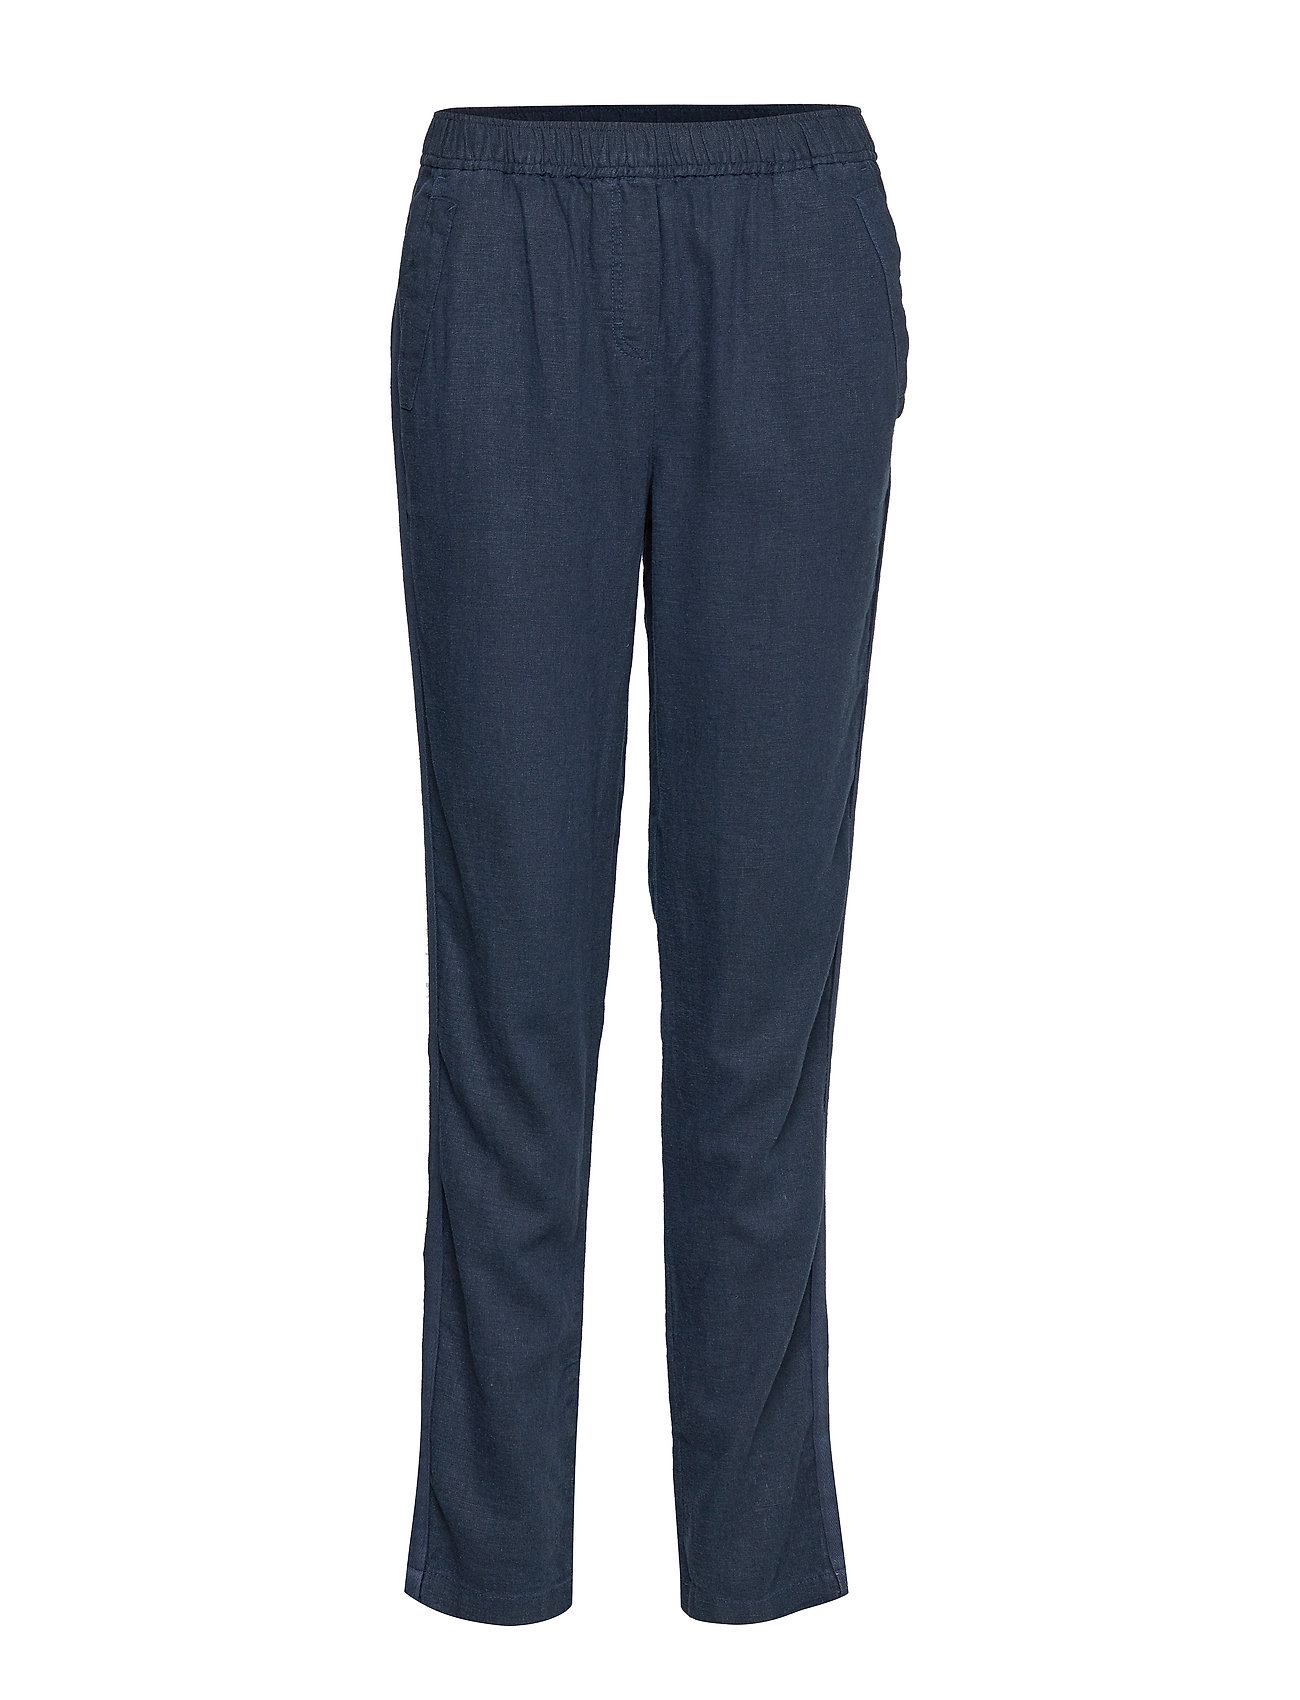 Brandtex Casual pants - MIDNIGHT BLUE